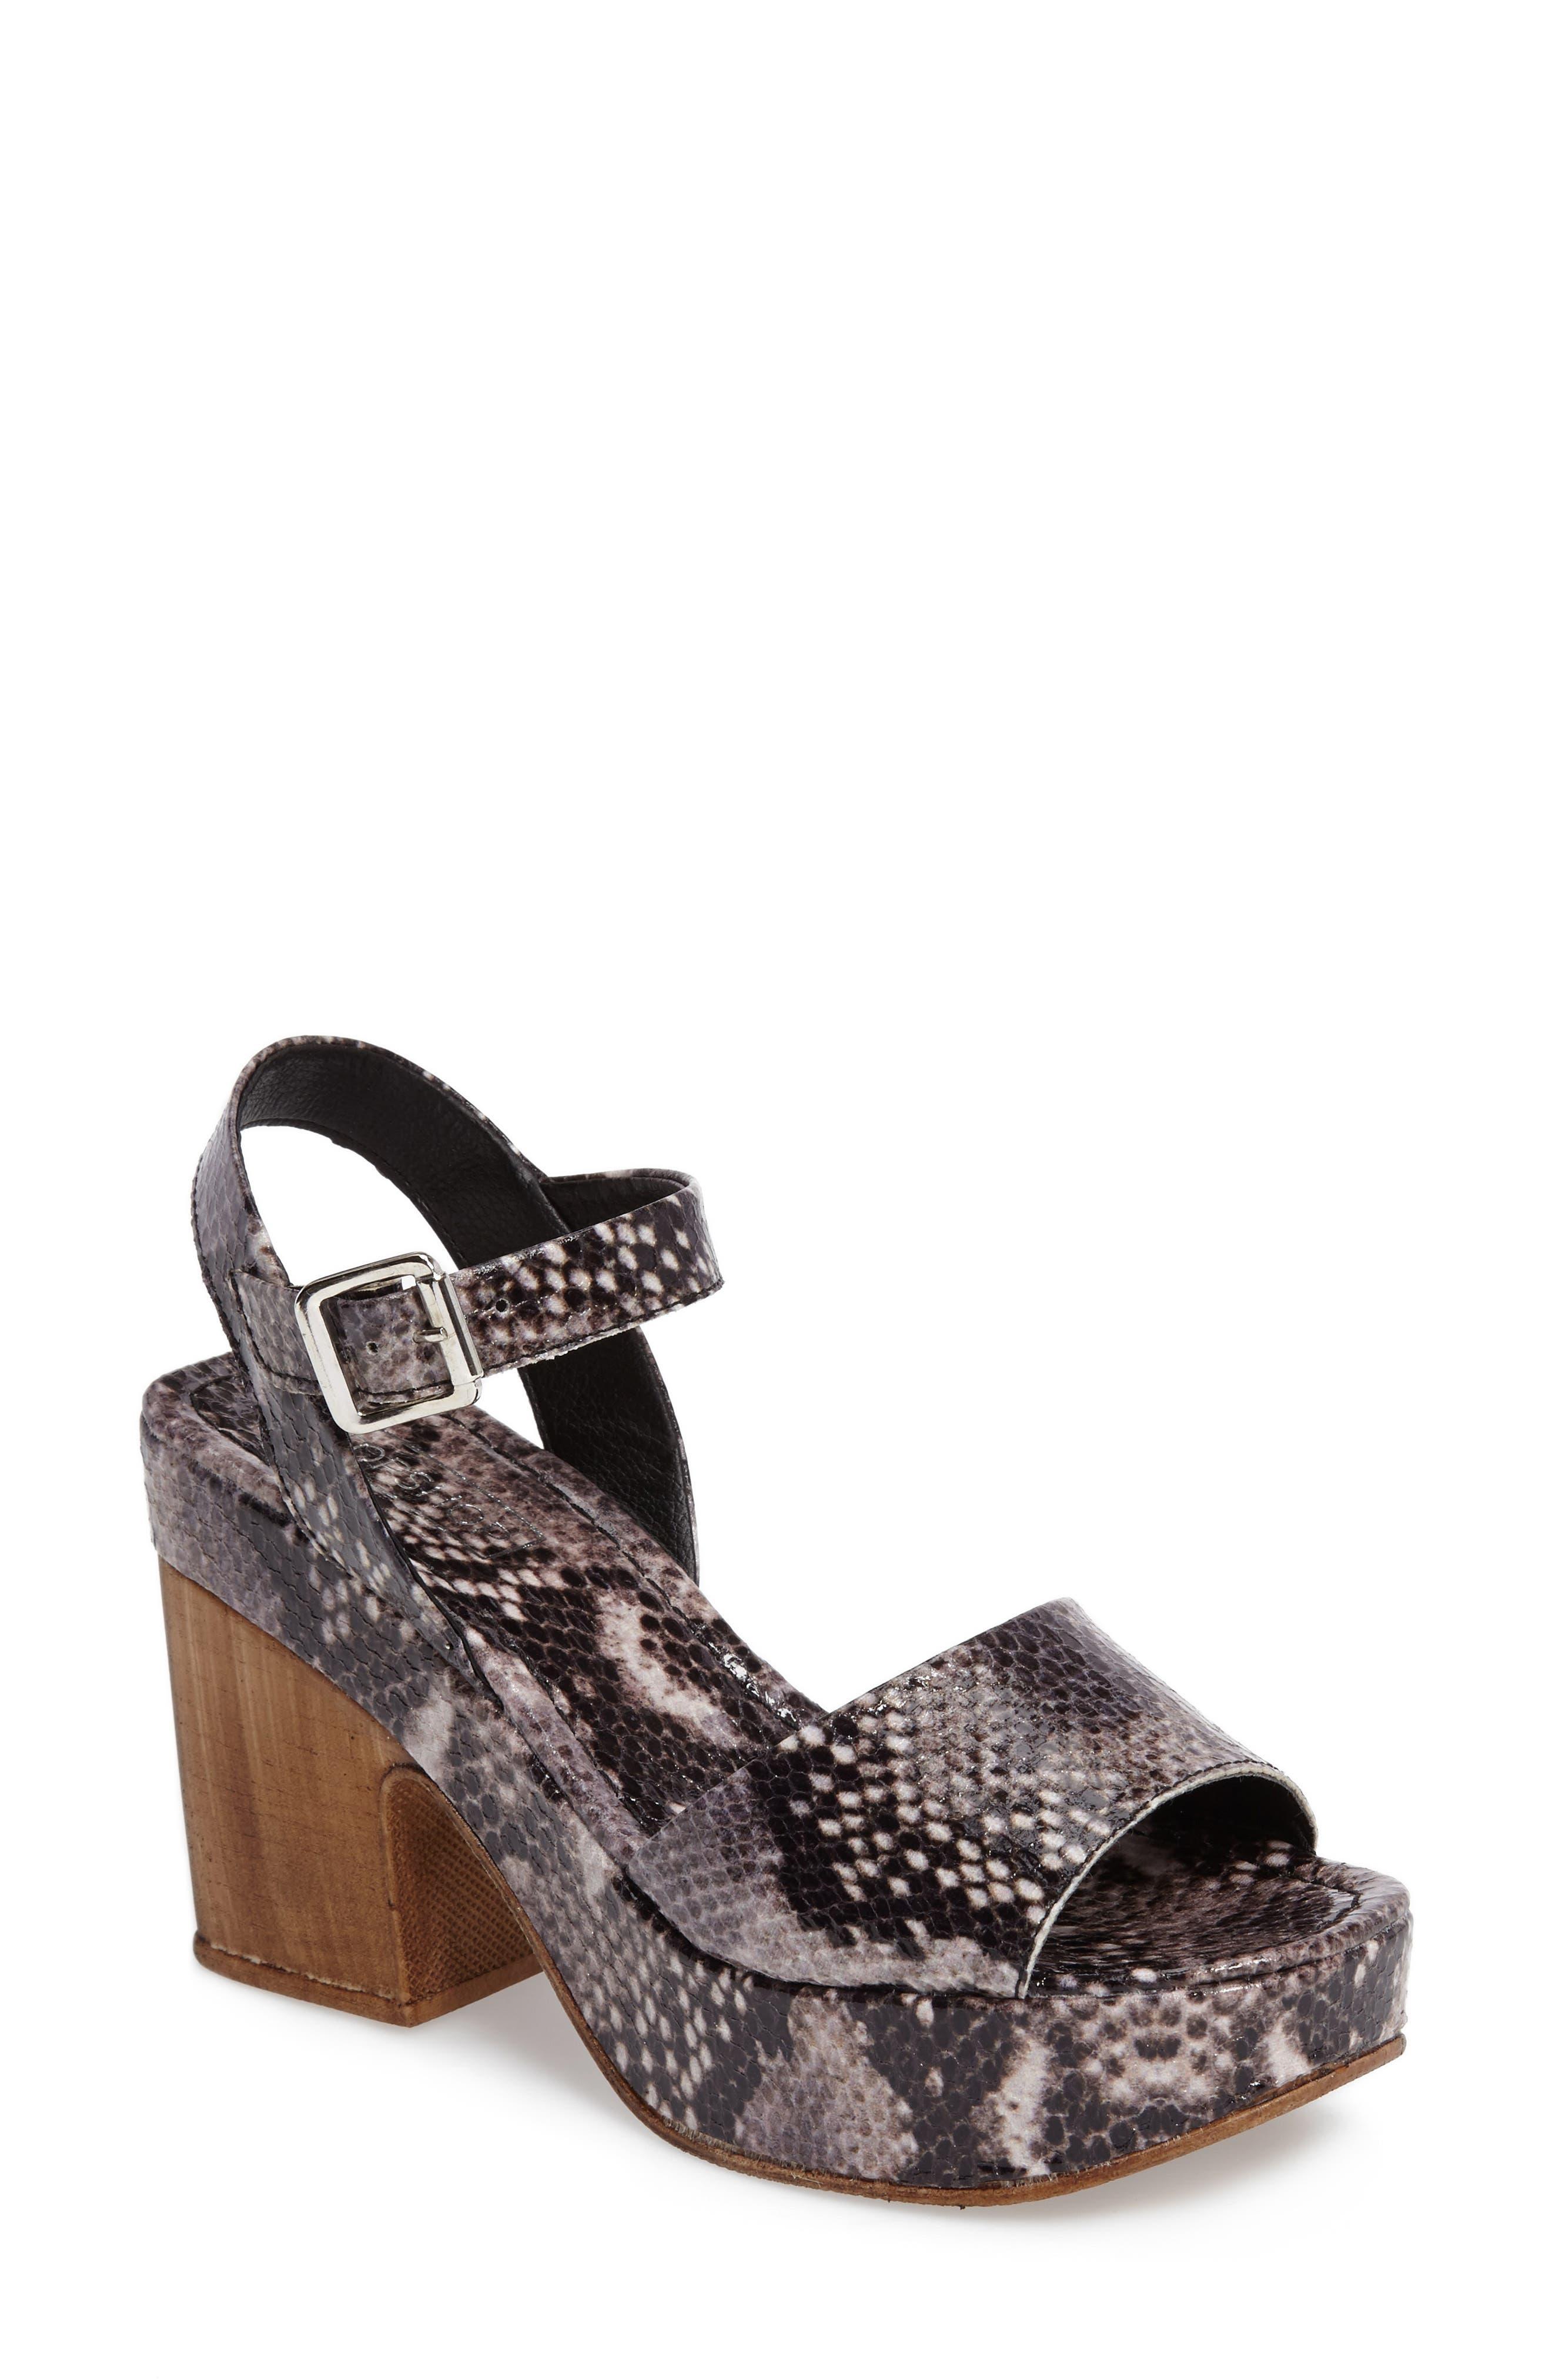 Main Image - Topshop Violets Platform Sandals (Women)